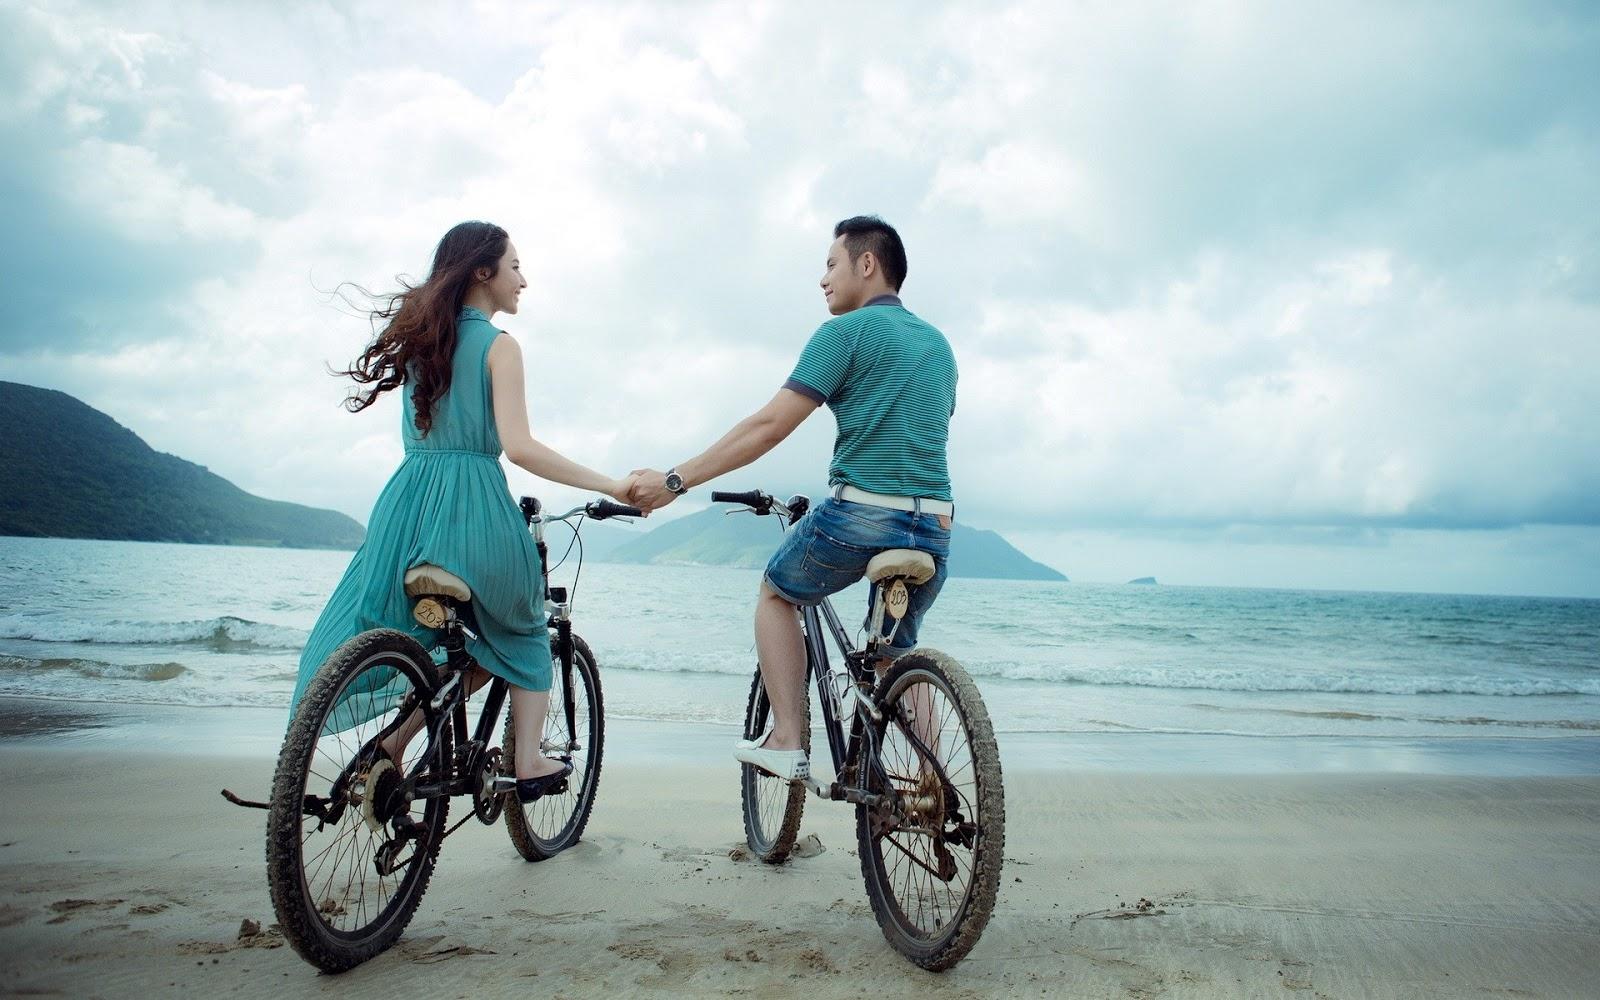 ನನ್ನವಳು : Romantic Love Poem in Kannada